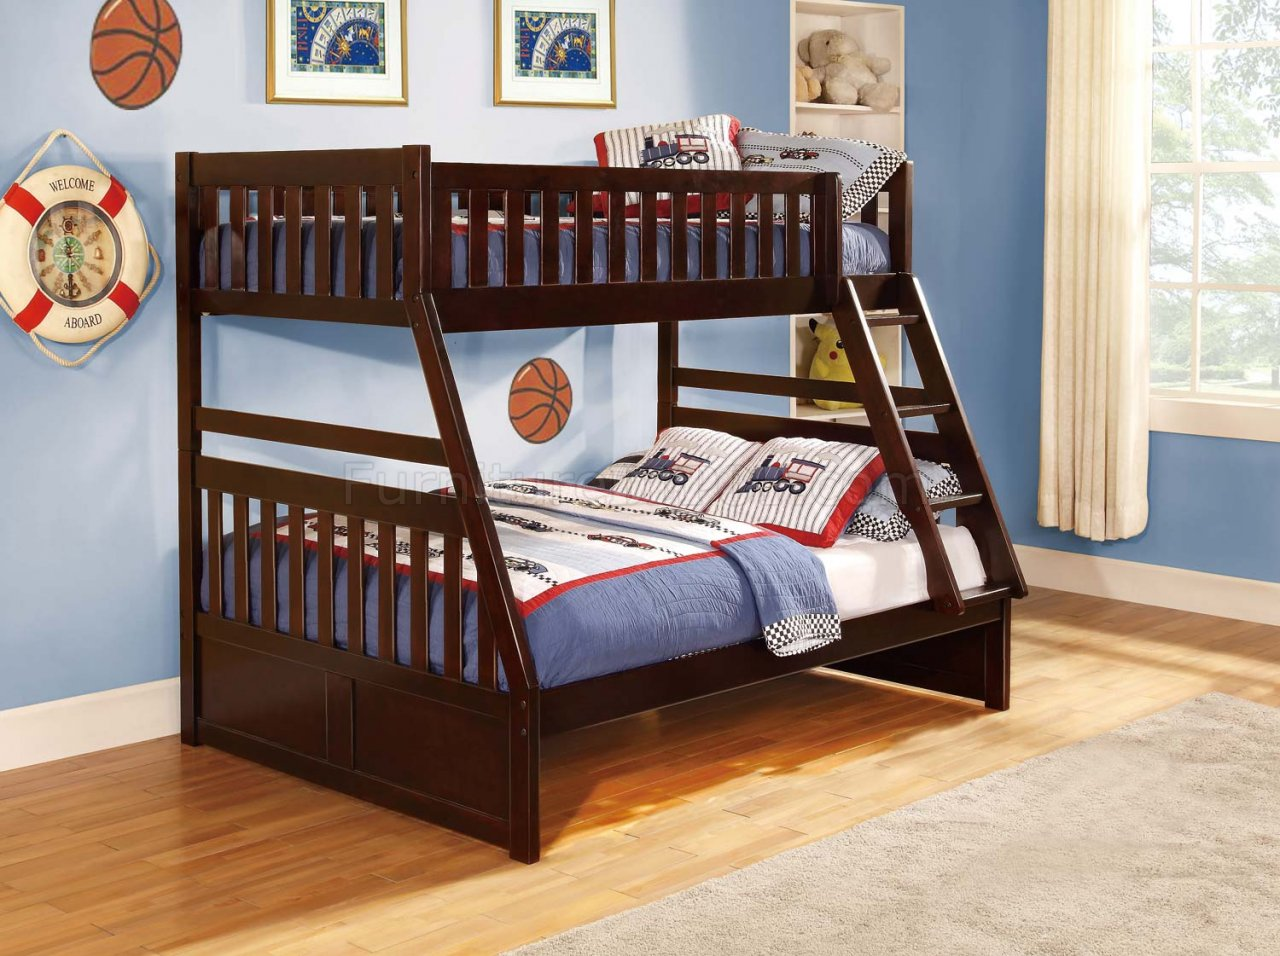 Rowe Twin Full Bunk Bed B2013 In Dark Cherry By Homelegance